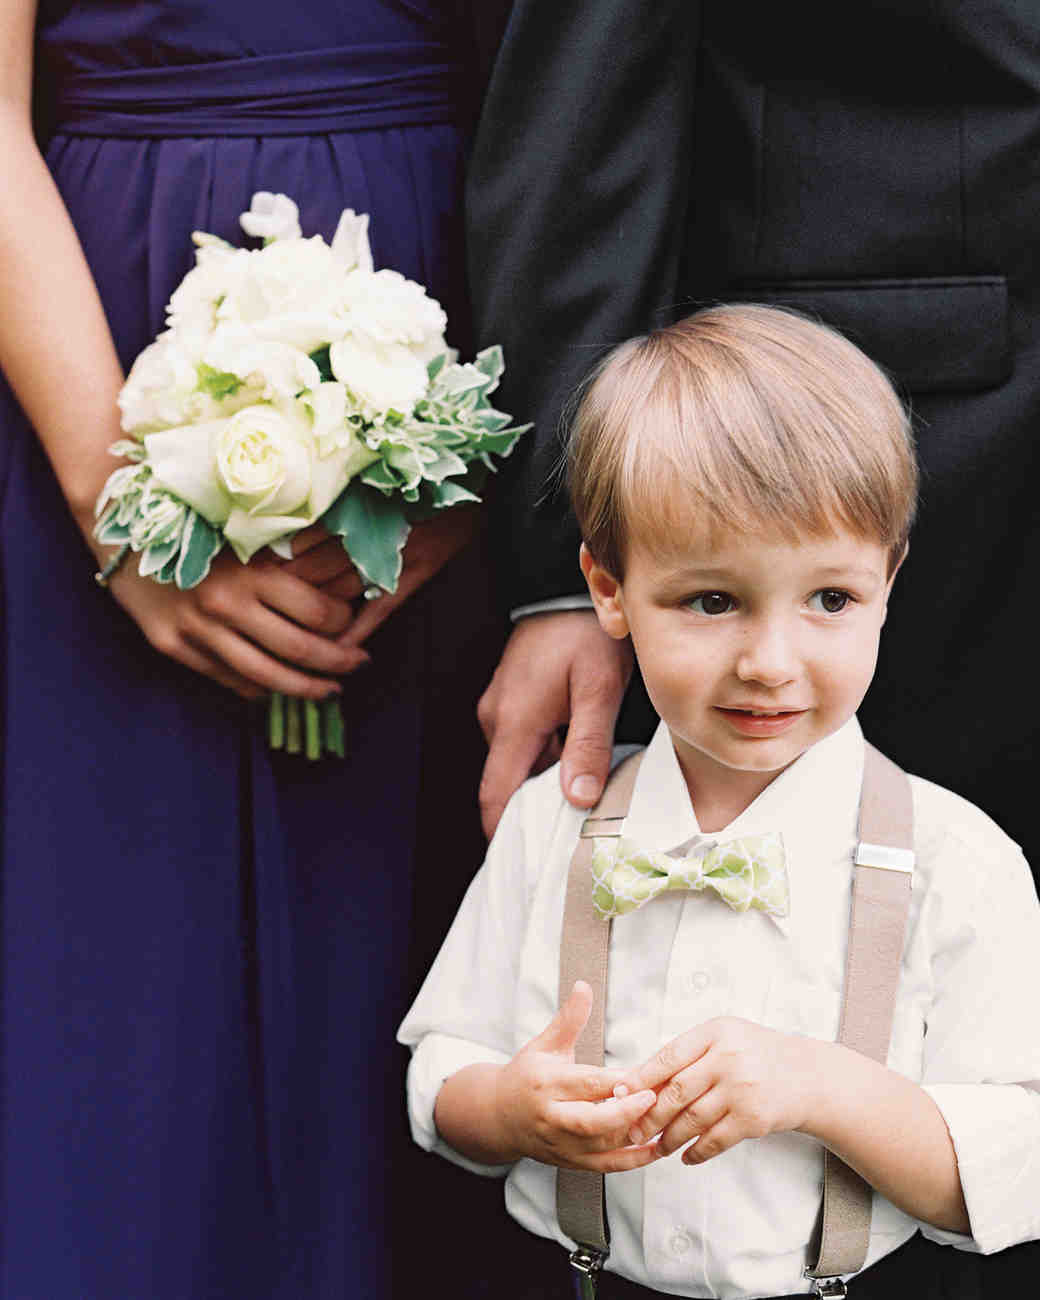 bridesmaids-bouquet-boy-008898-r1-008-copy-mwds110846.jpg